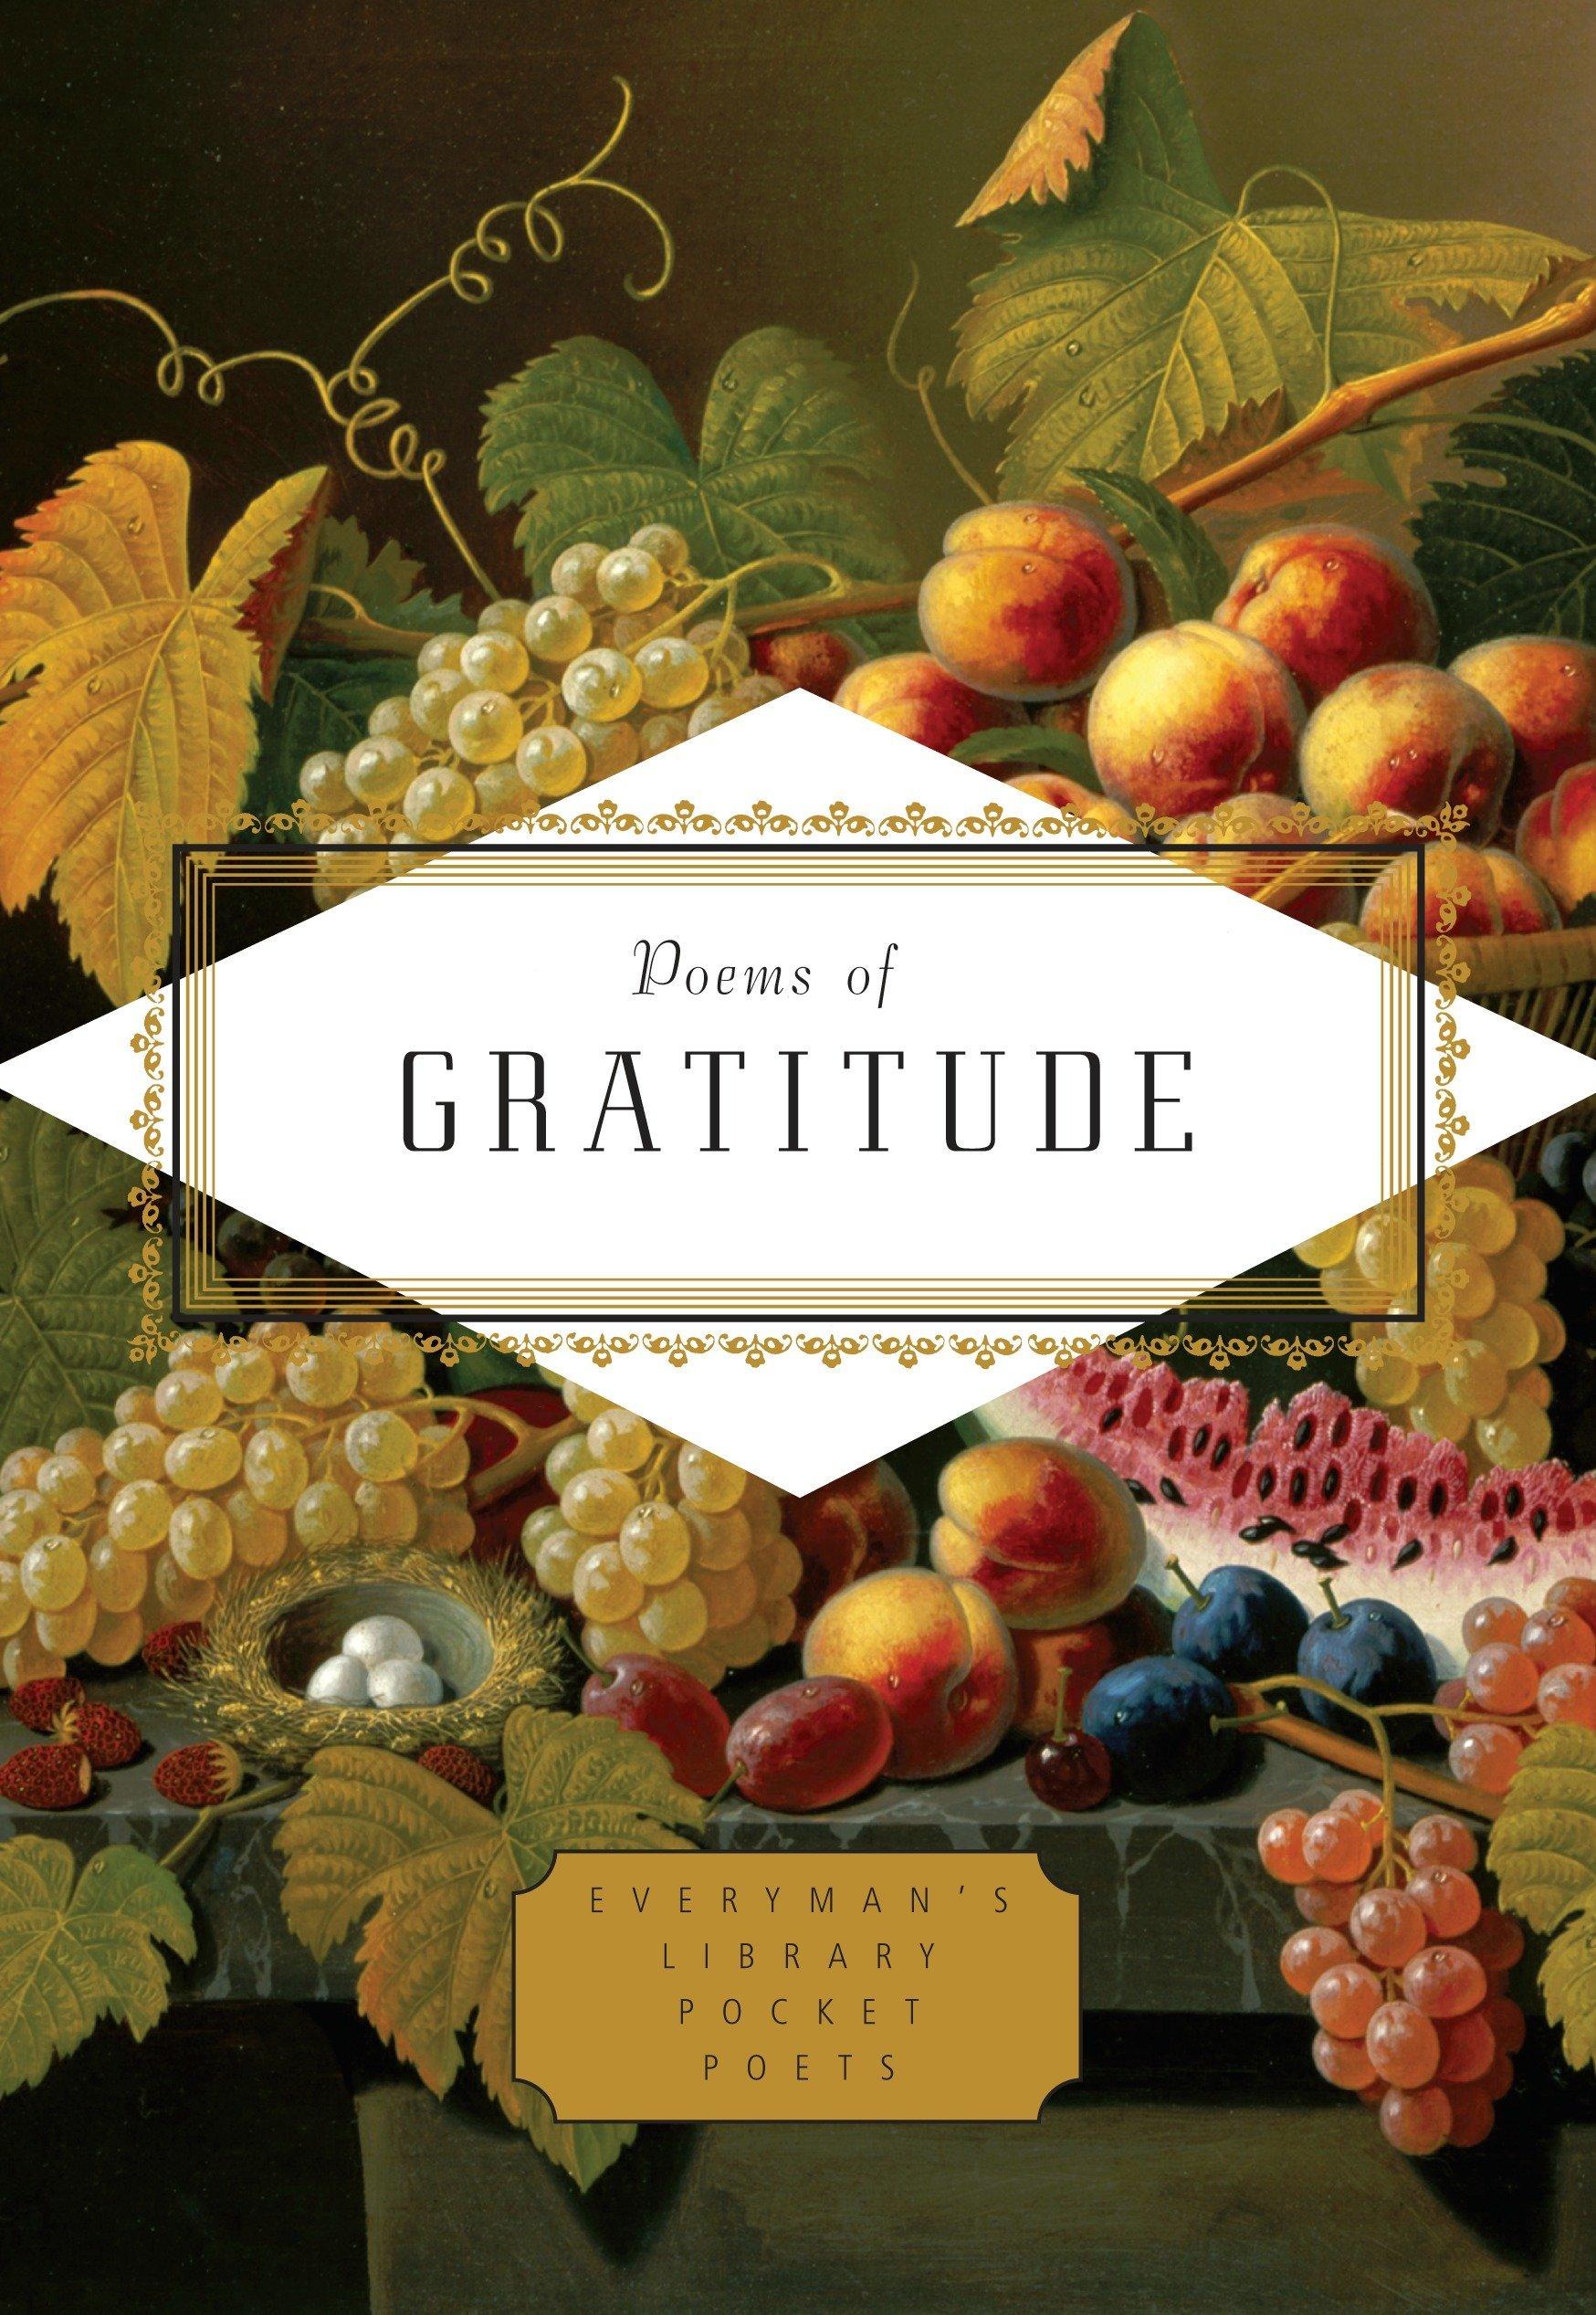 Poems of Gratitude (Everyman's Library Pocket Poets Series) Hardcover –  September 12, 2017